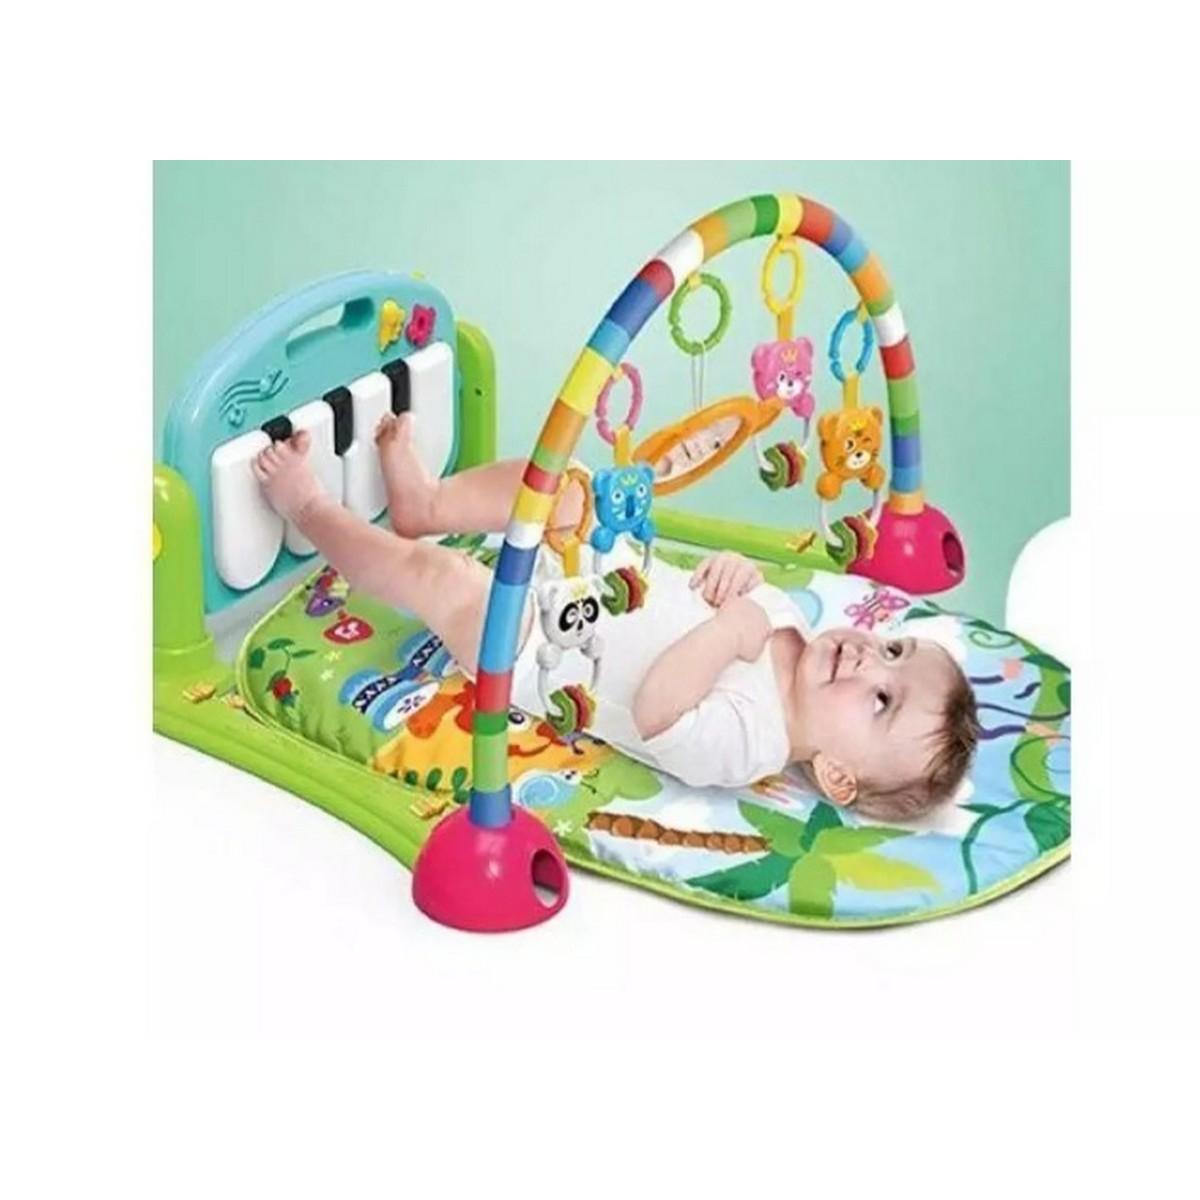 Huanger  Newborn Baby Play Gym Piano Fitness Rack Mat